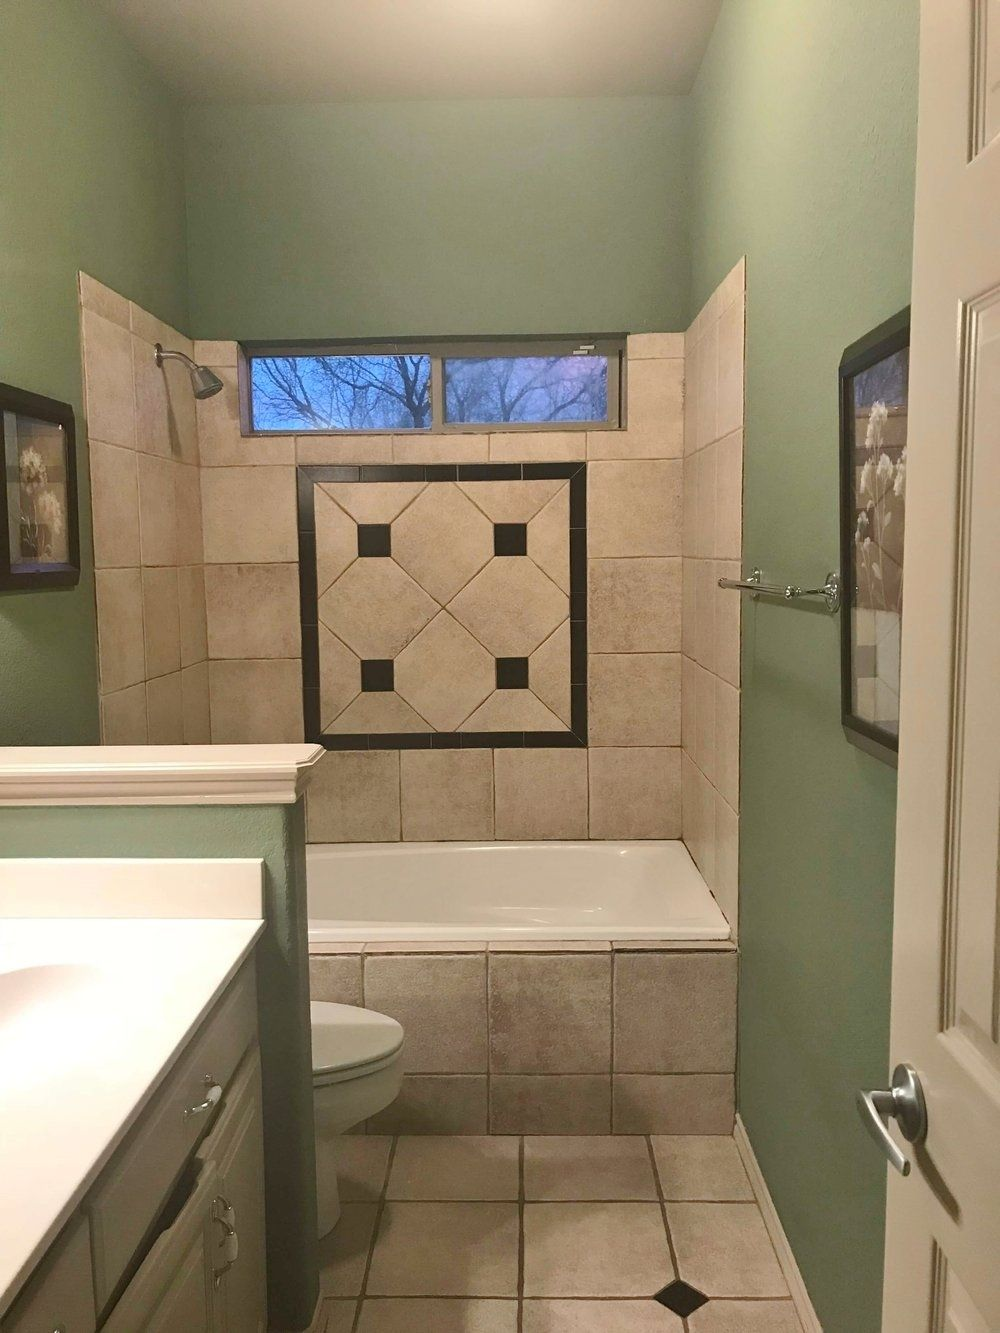 Mindblowing Inspirational The 12 Perfect 10 X 5 Bathroom Remodel Ideas Ij07zu Https Ijcar 2016 Info T Bathroom Layout Bathroom Remodel Designs Bathroom Plans